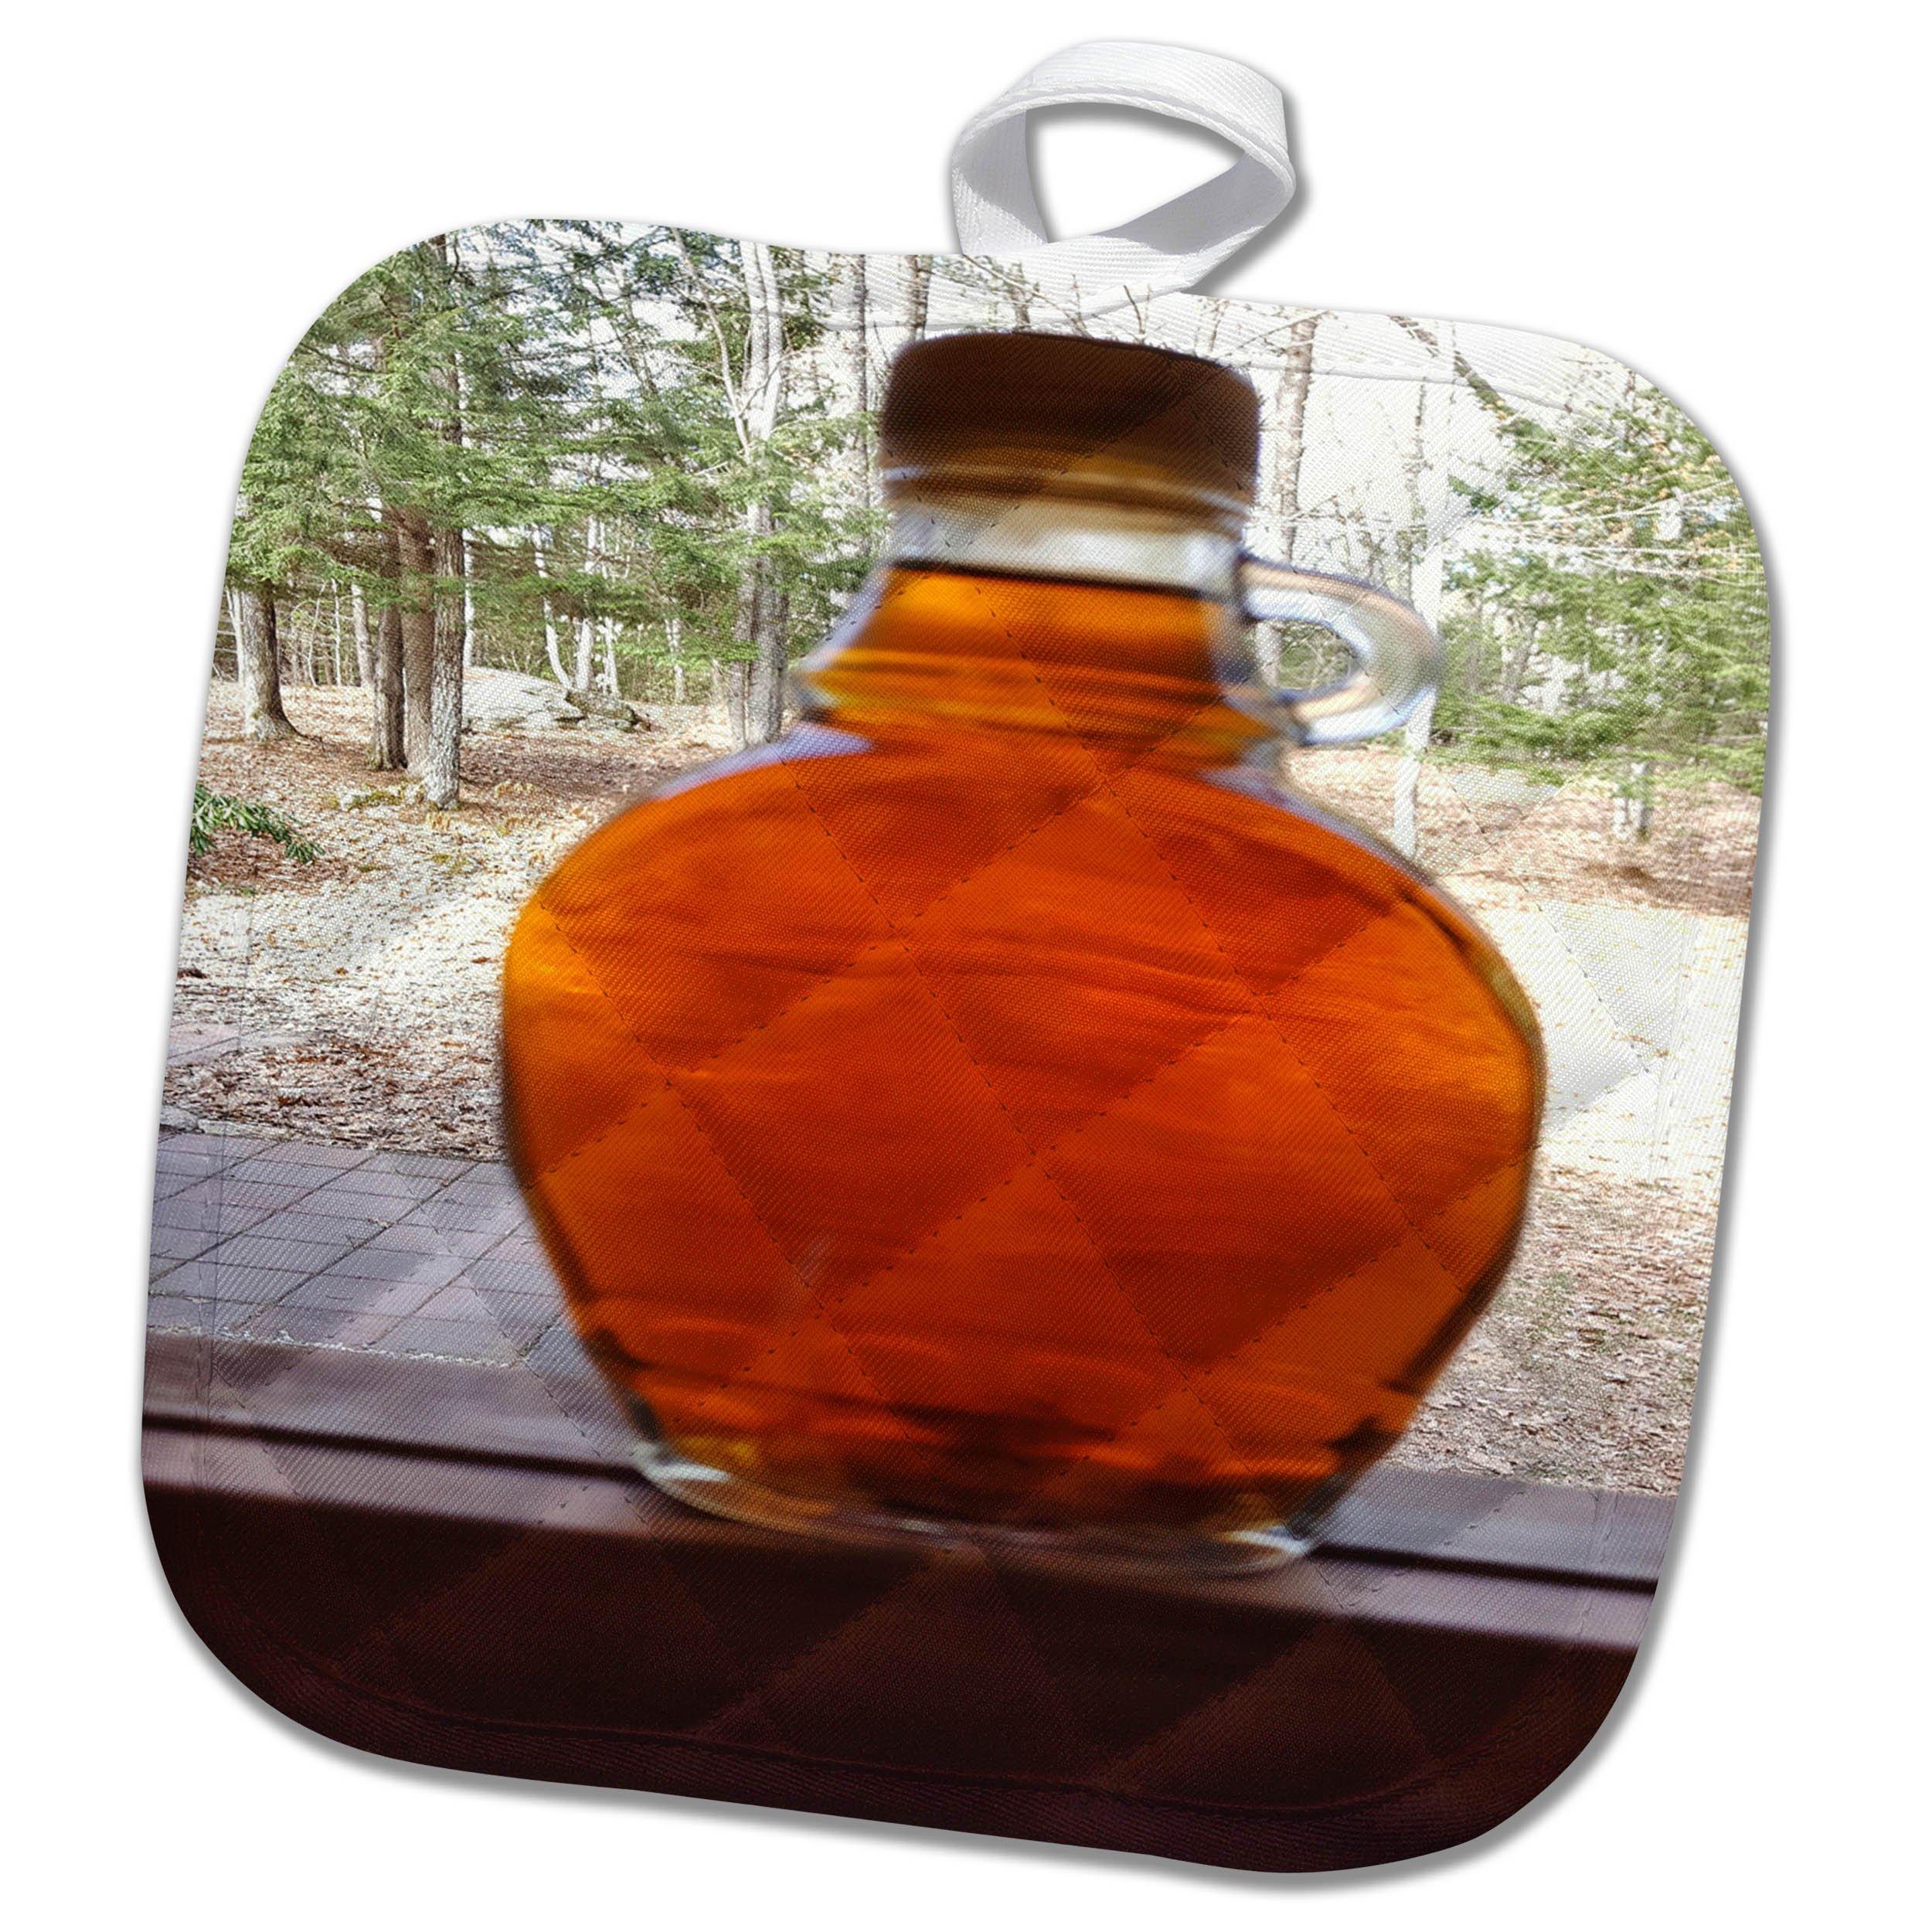 3dRose TDSwhite – Miscellaneous Photography - Maple Syrup Bottle Windowsill - 8x8 Potholder (phl_285357_1)